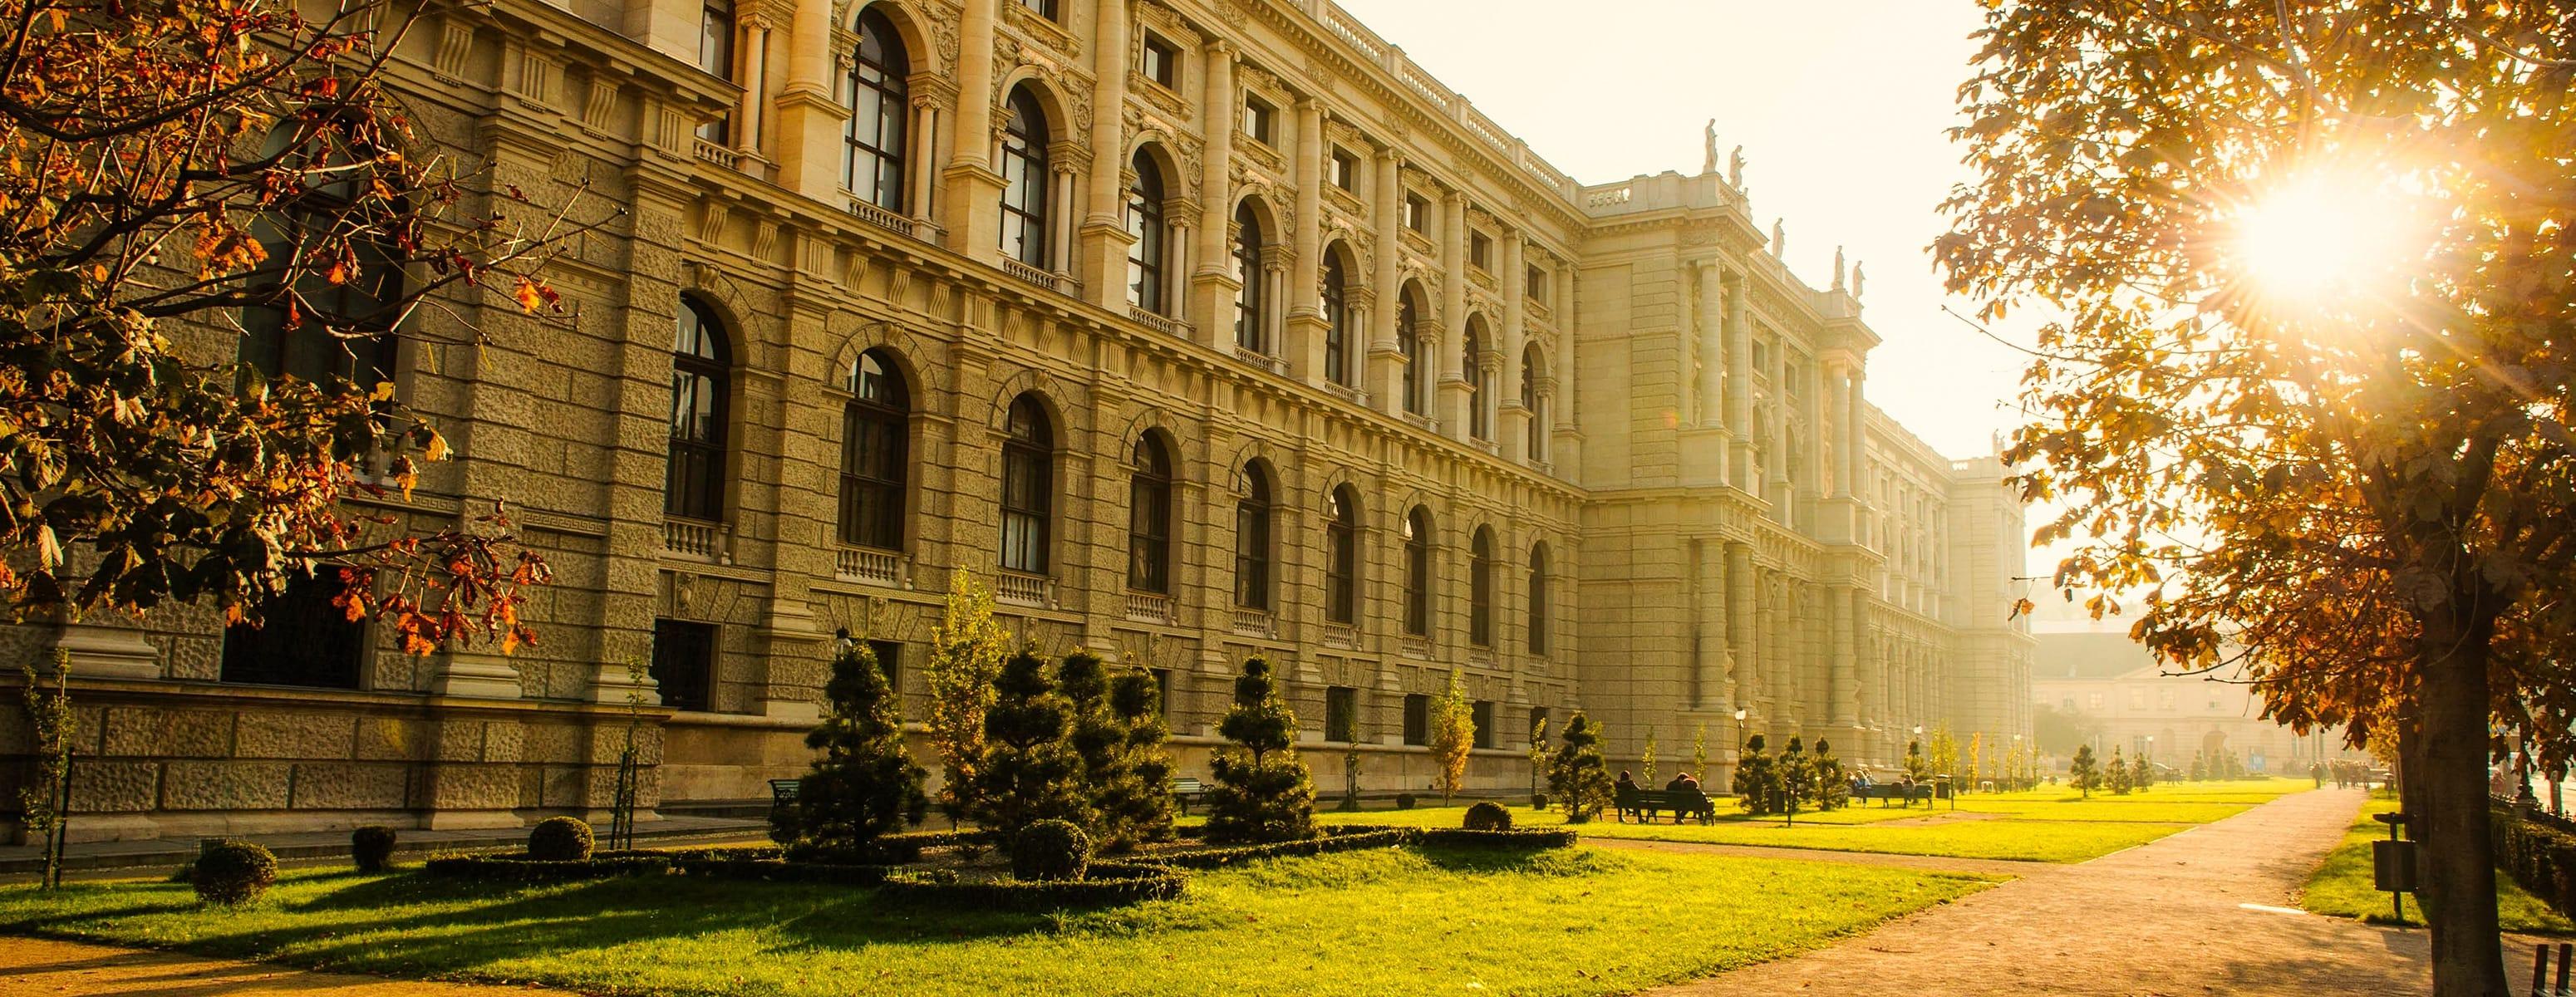 Wien 2018 (mit Fotos): Die 20 besten Unterkünfte in Wien ...